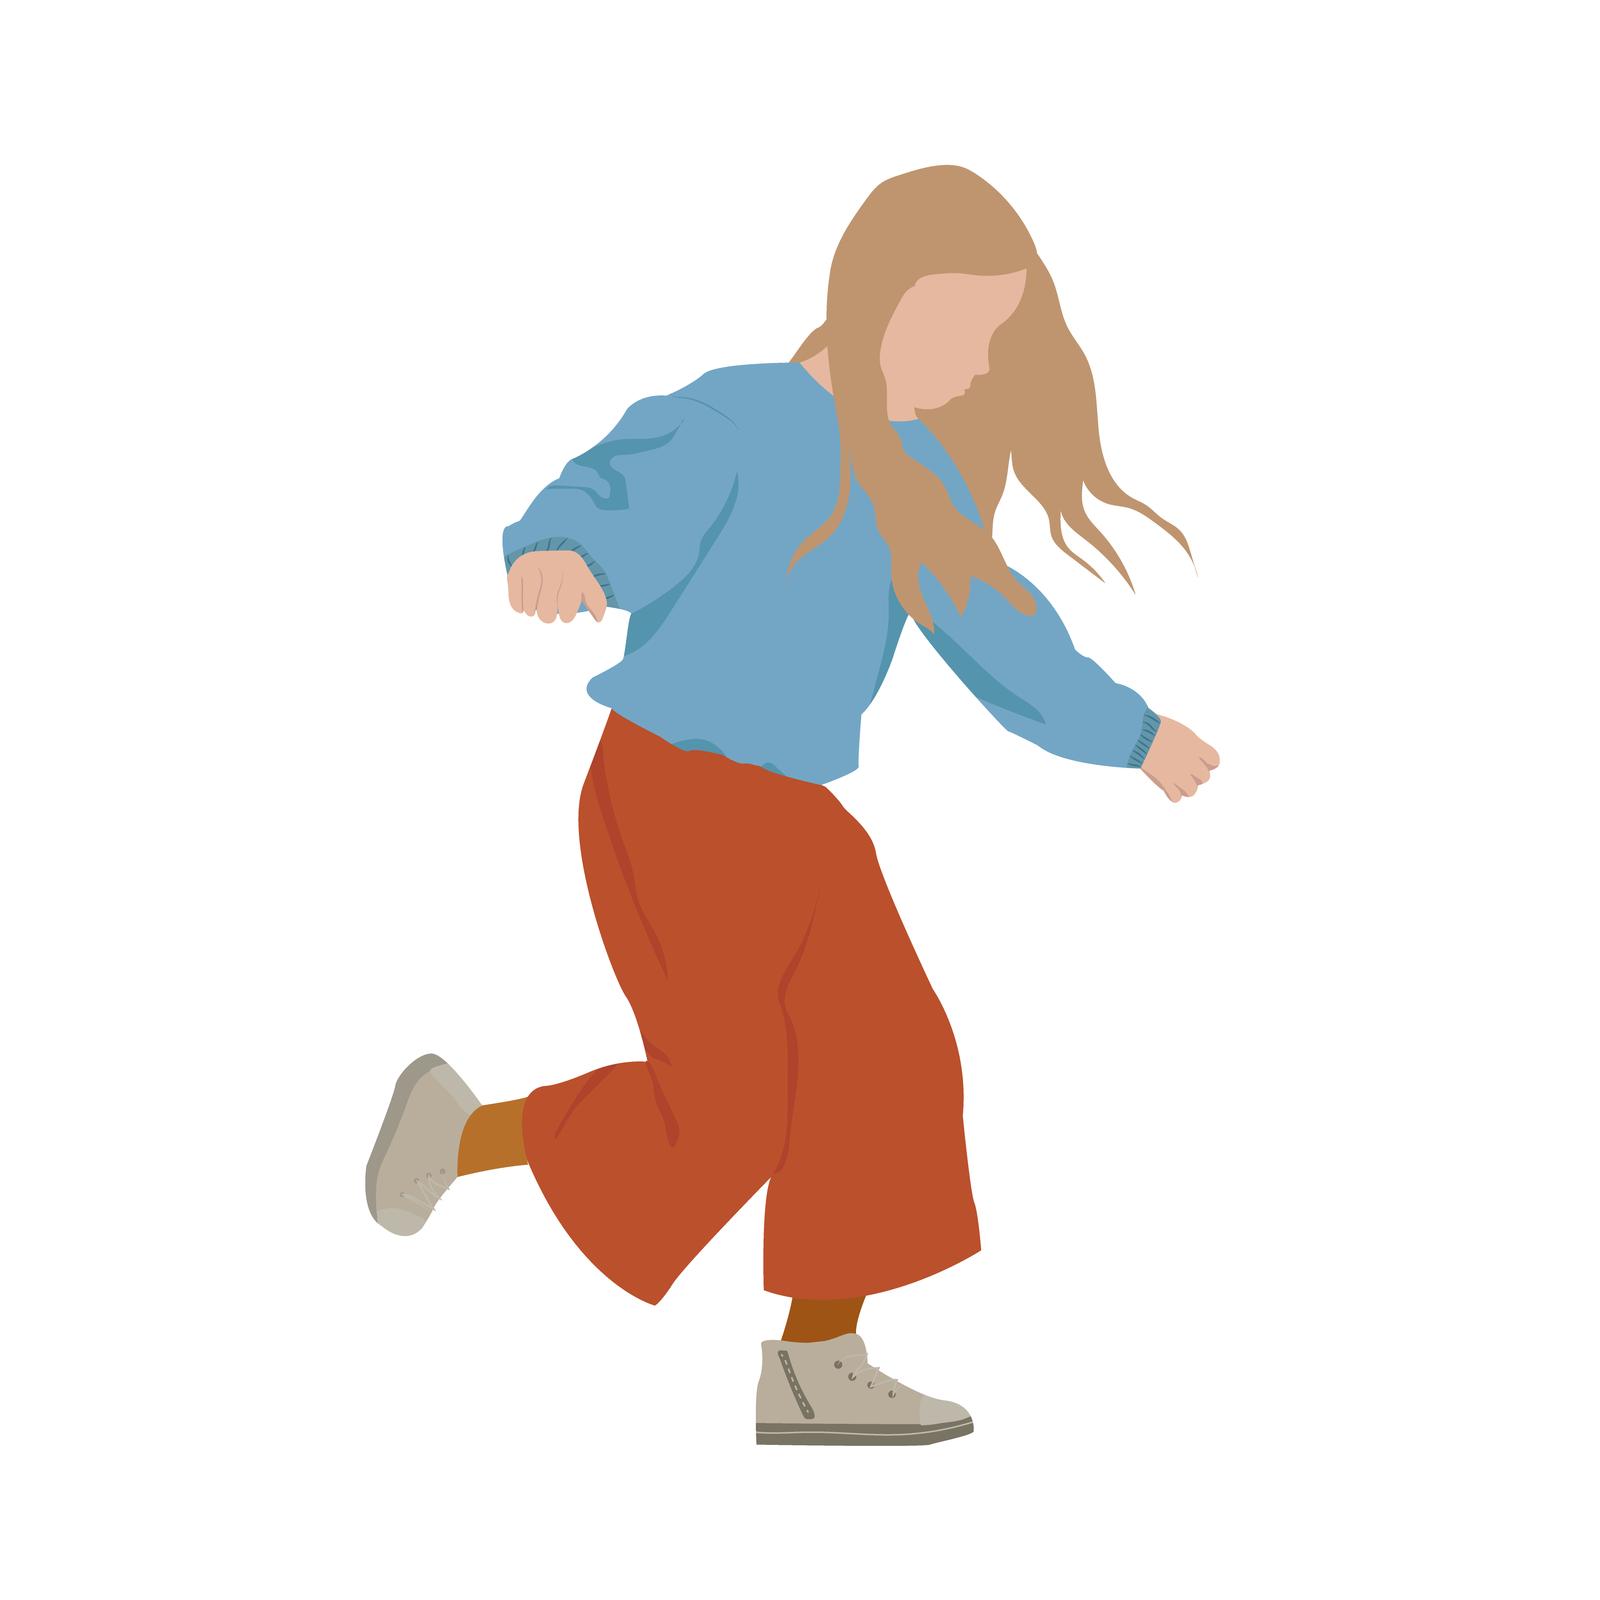 Kids Vector Illustration Download Now Studio Alternativi Children Illustration People Illustration Running Illustration